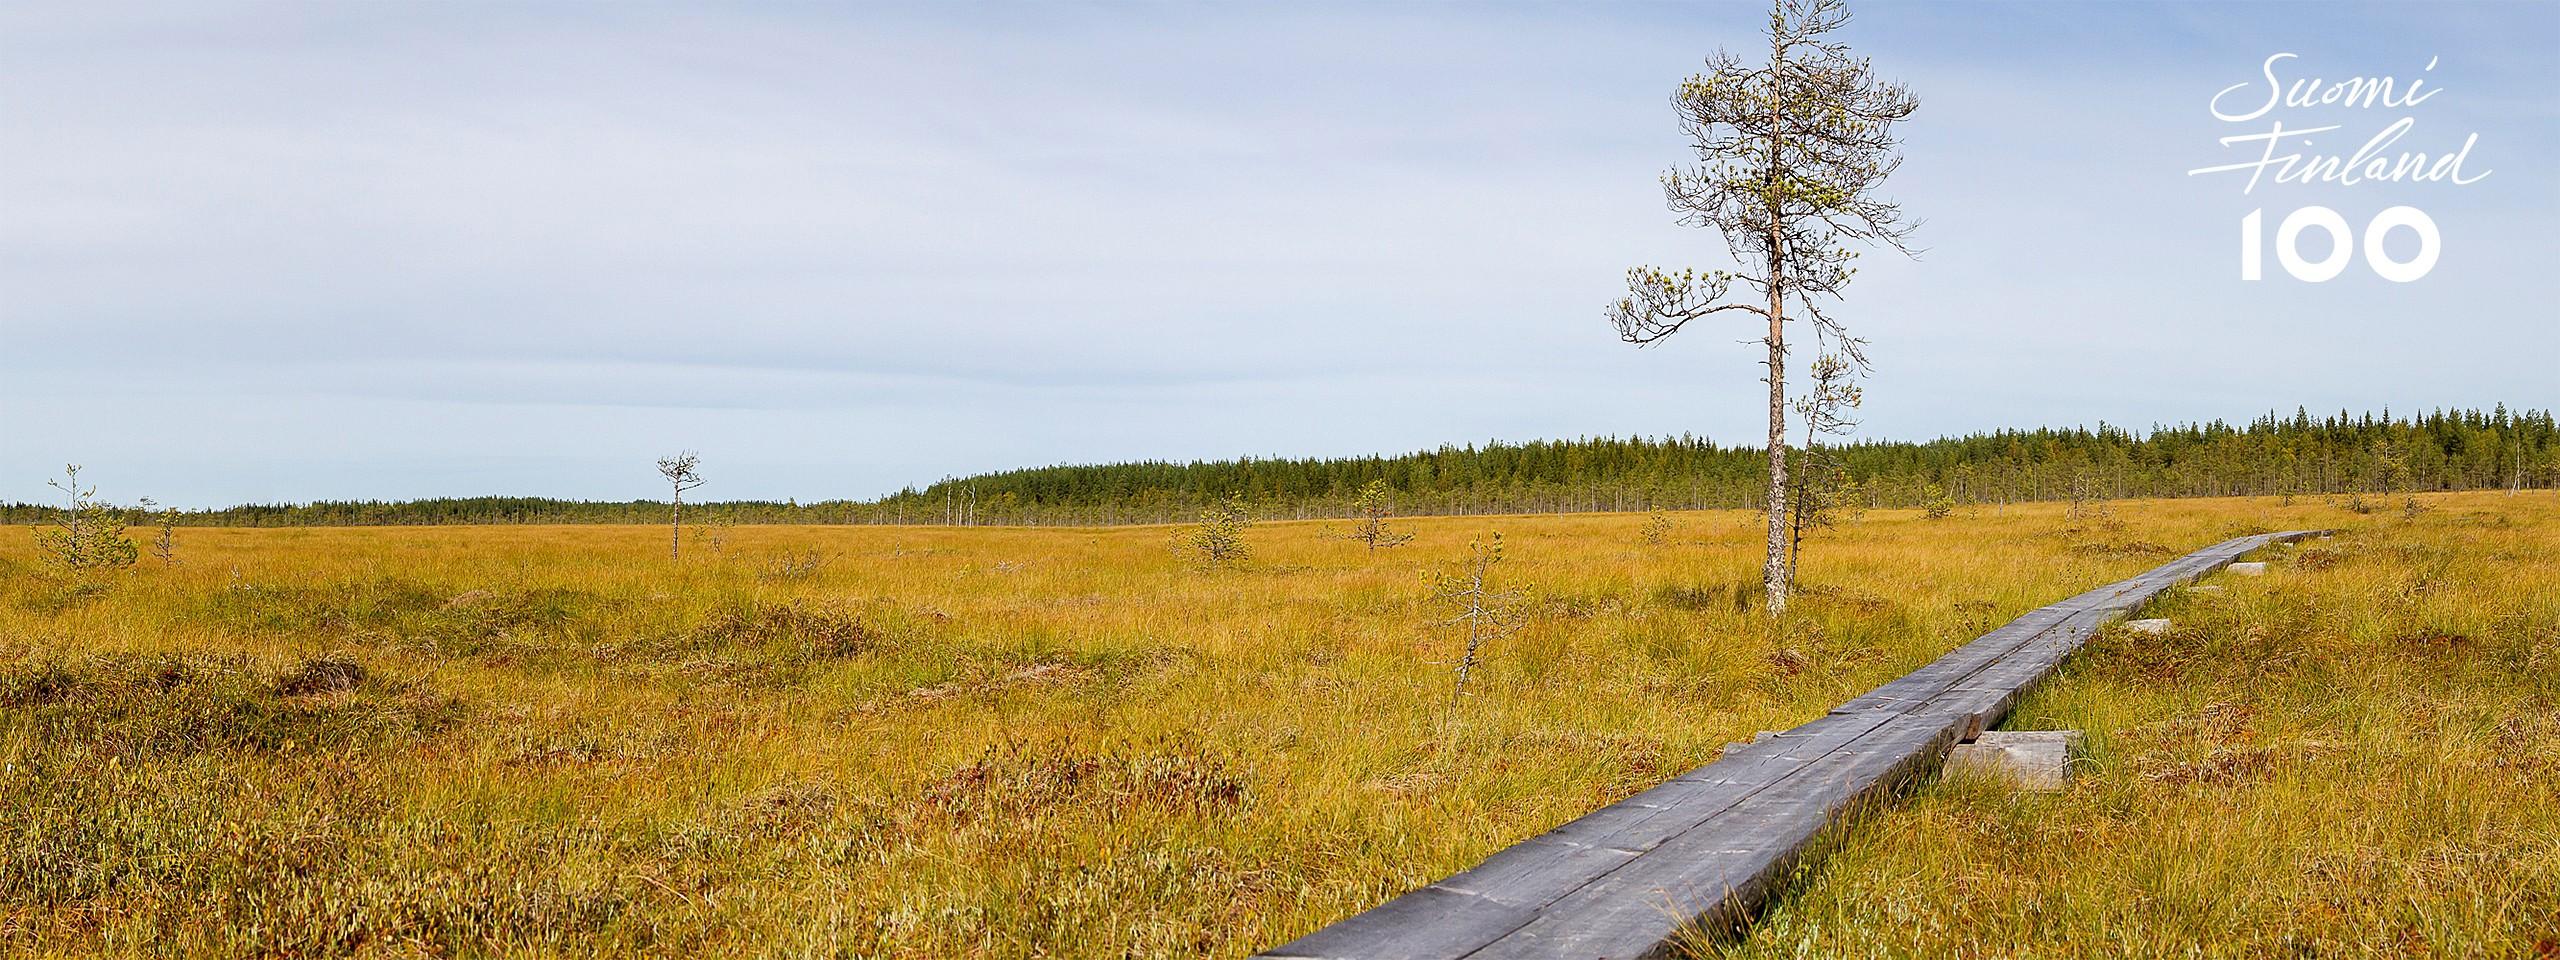 Lahjoita satavuotiaalle Suomelle palanen suojeltua luontoa - WWF 0e8bad6c9a